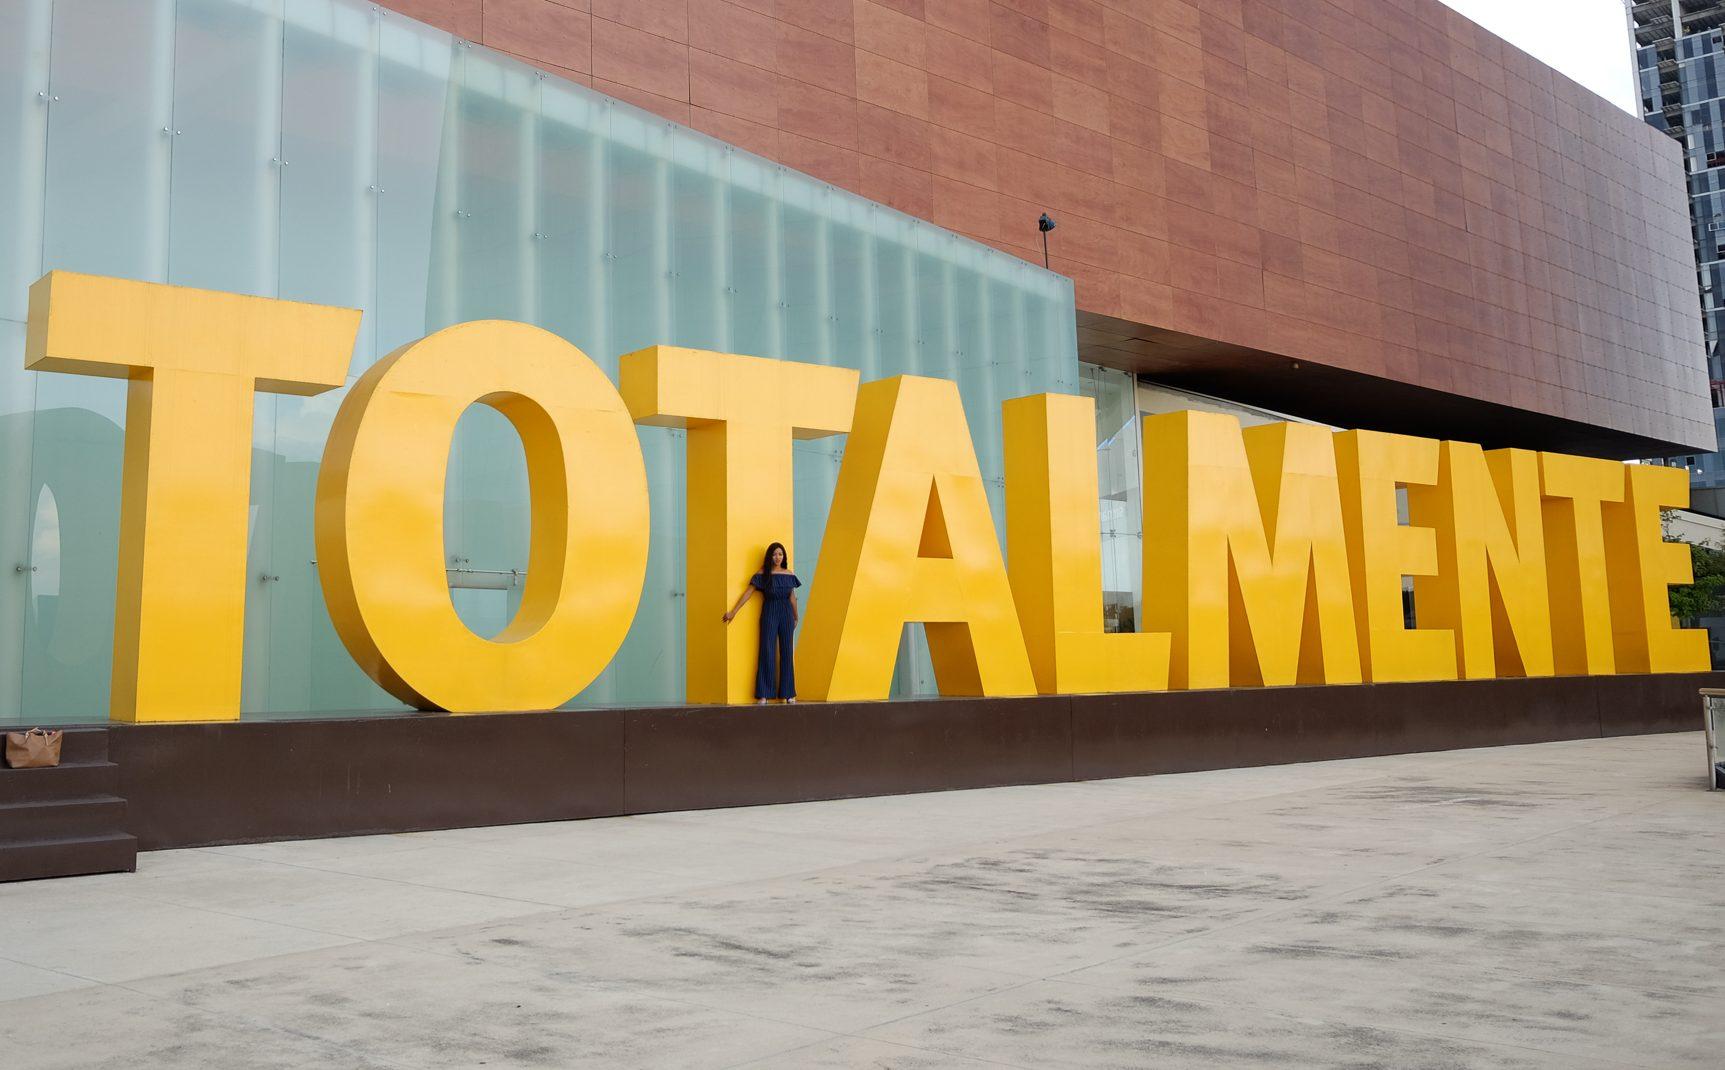 me in front of the totalmente sign in Guadalajara